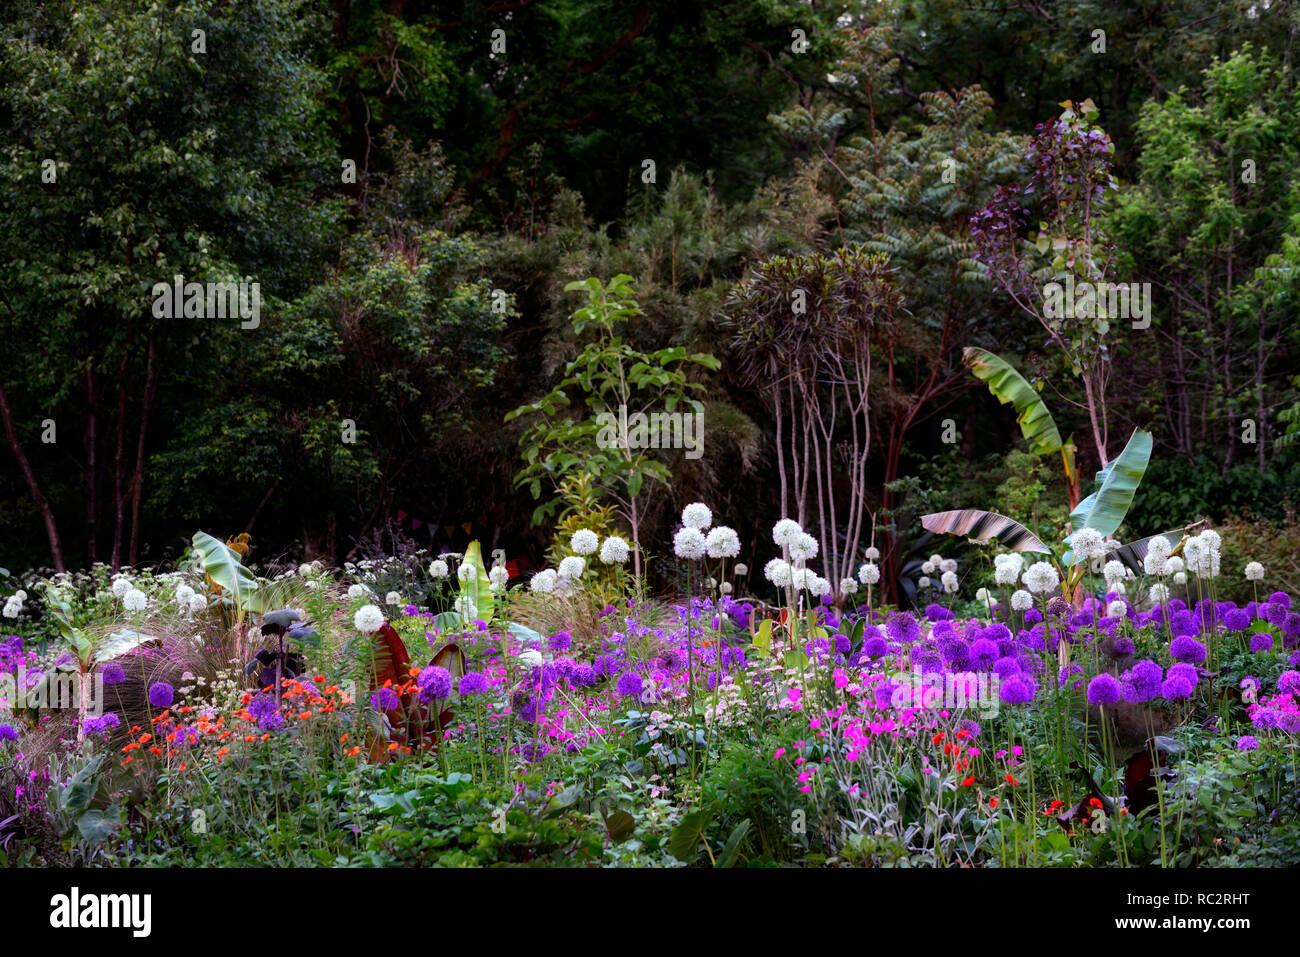 Allium Purple Sensation,Allium Mount Everest,Lychnis coronaria Hills Ground,pink white purple flowers,flowering,mix,mixed,combination,bed,border,plant - Stock Image